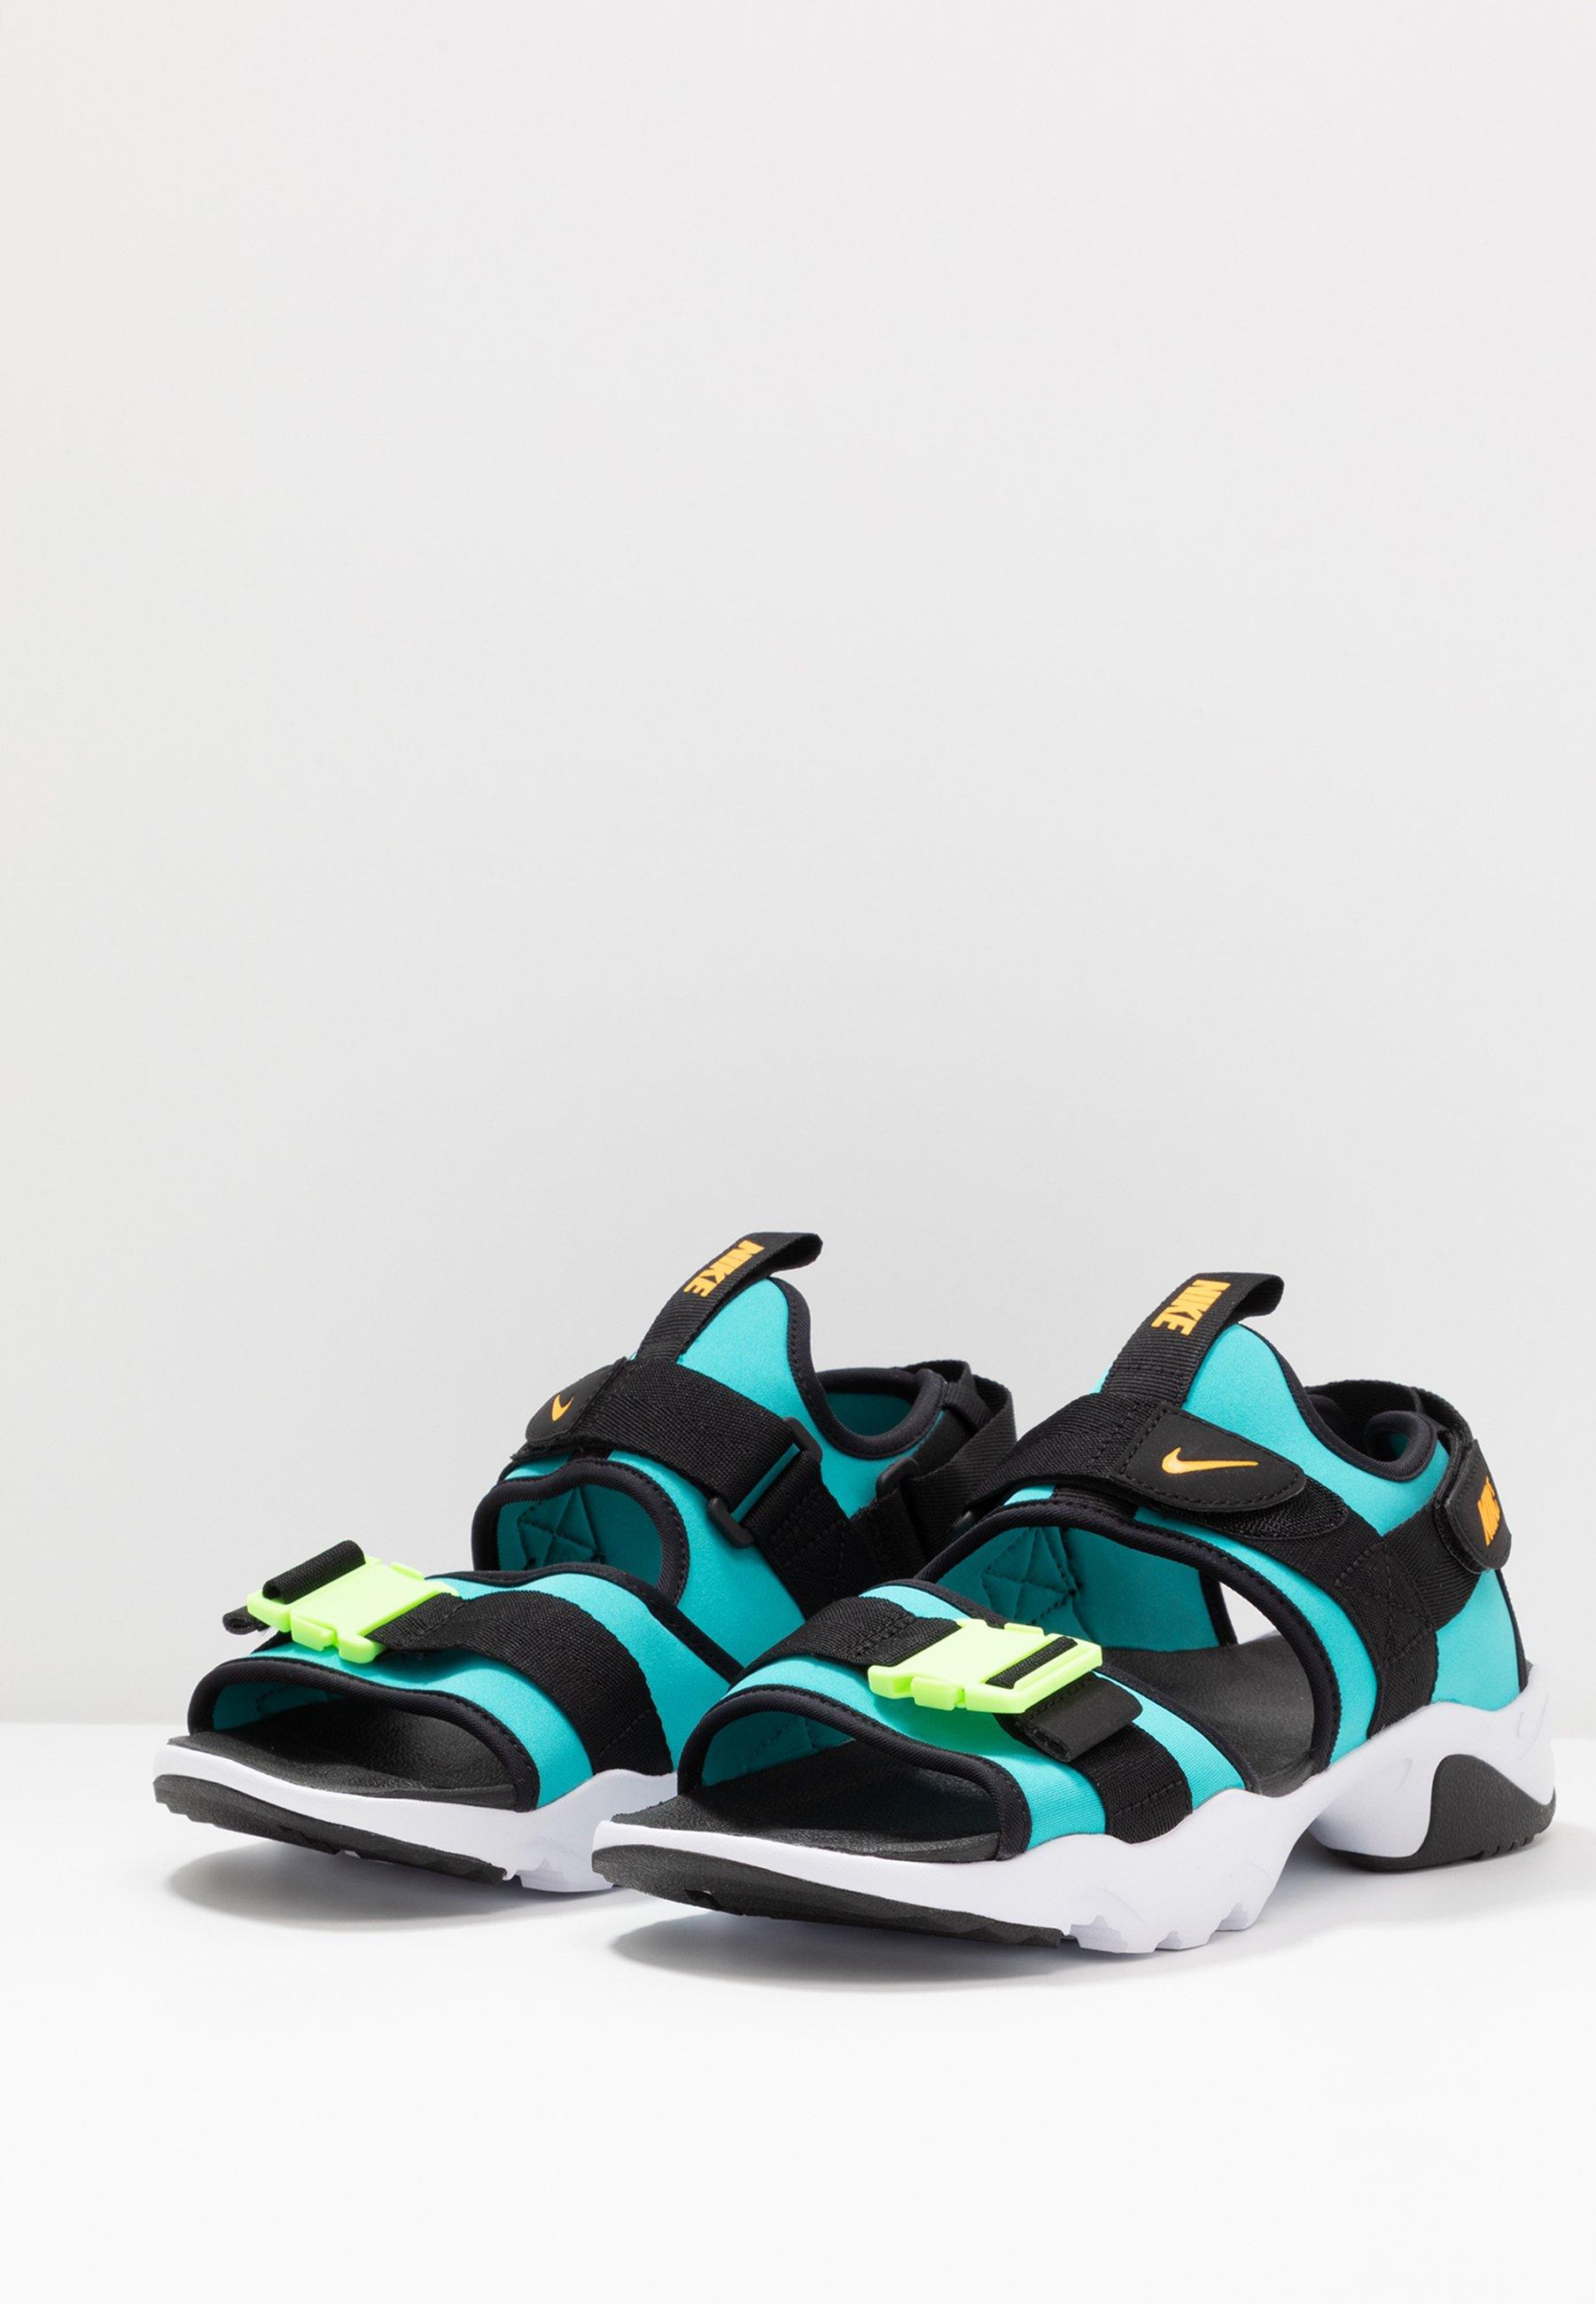 Best Selling Latest Discount Women's Shoes Nike Sportswear DUMMY Walking sandals oracle aqua/laser orange/black/ghost green/white CuNH8maBQ c0ckotU6F